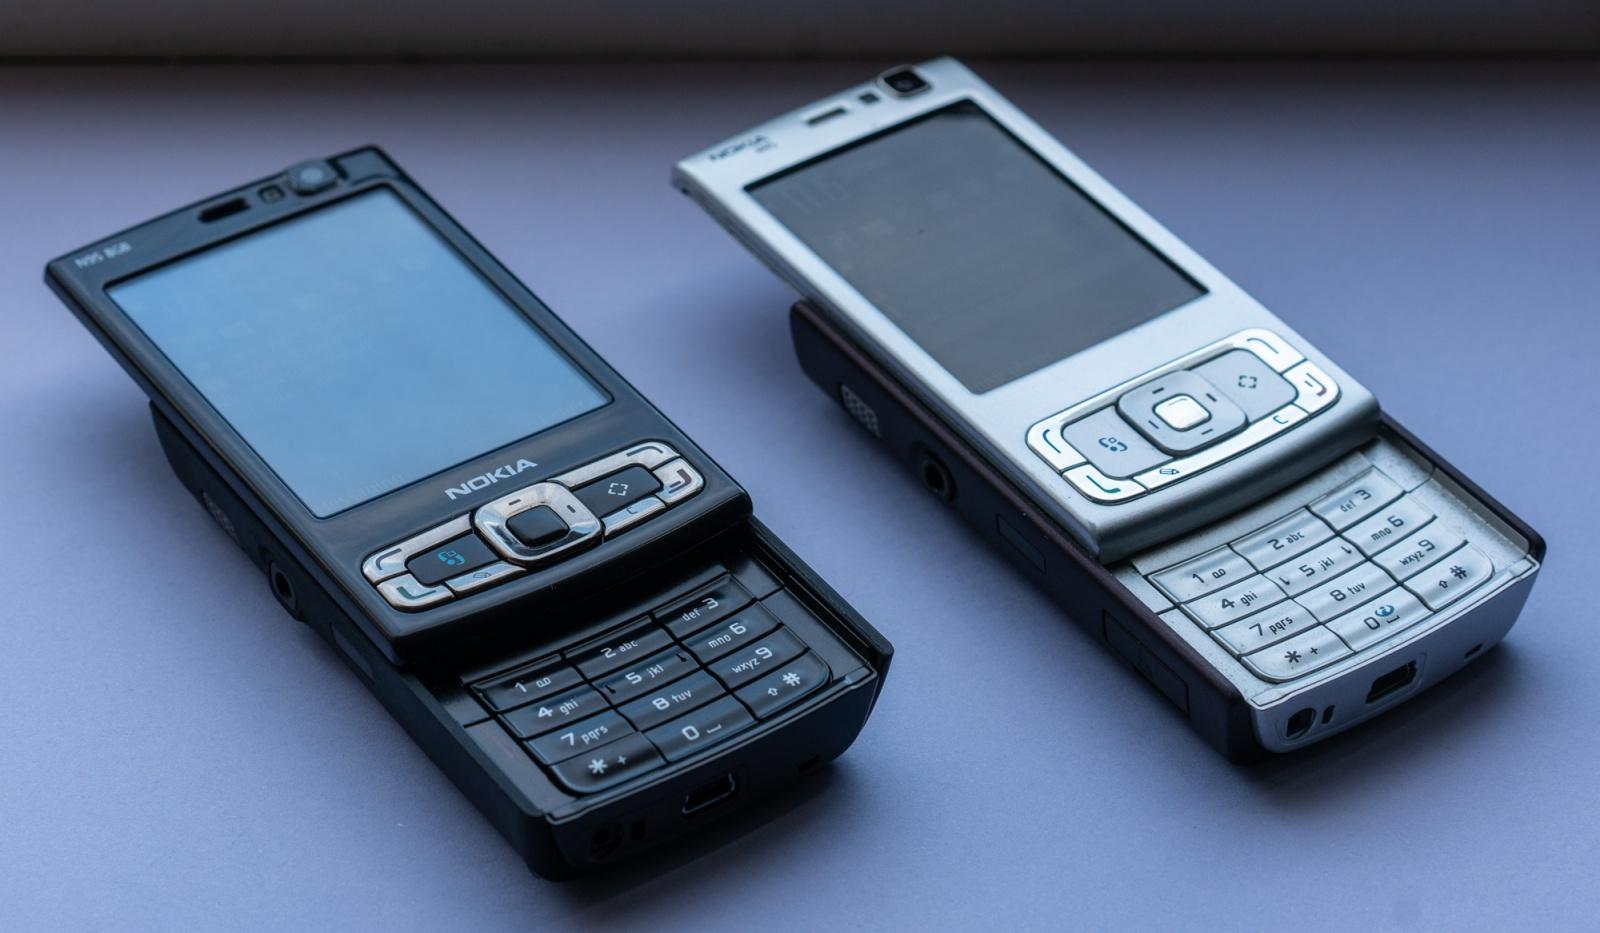 Nokia N95, лучший смартфон старой школы - 3